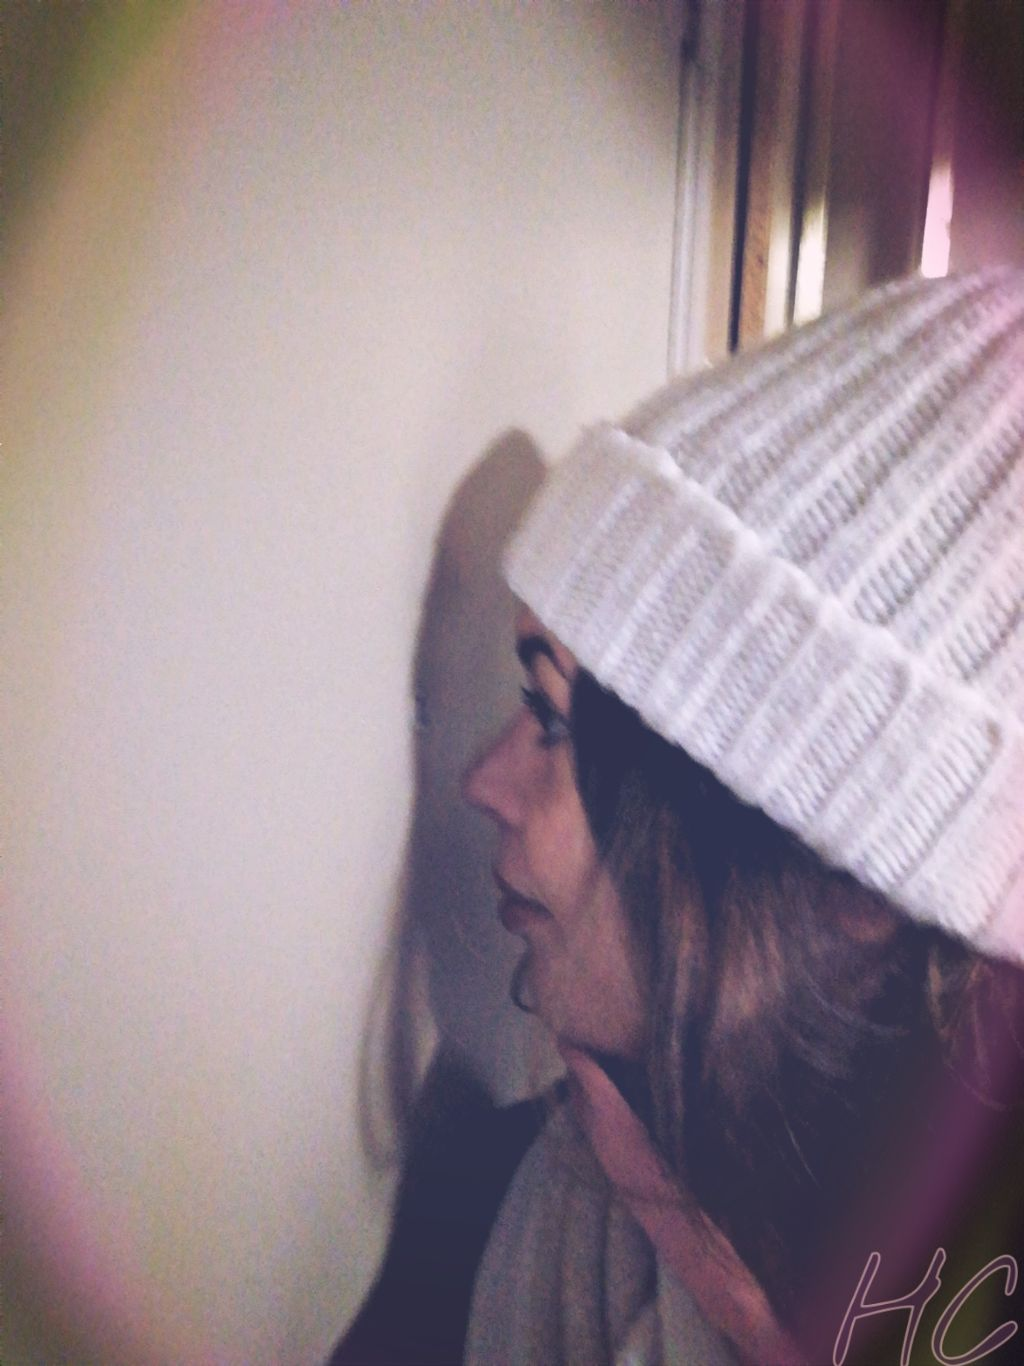 #me #lookingout #winter #cold #mask #hue #myedit #missingsummer #see